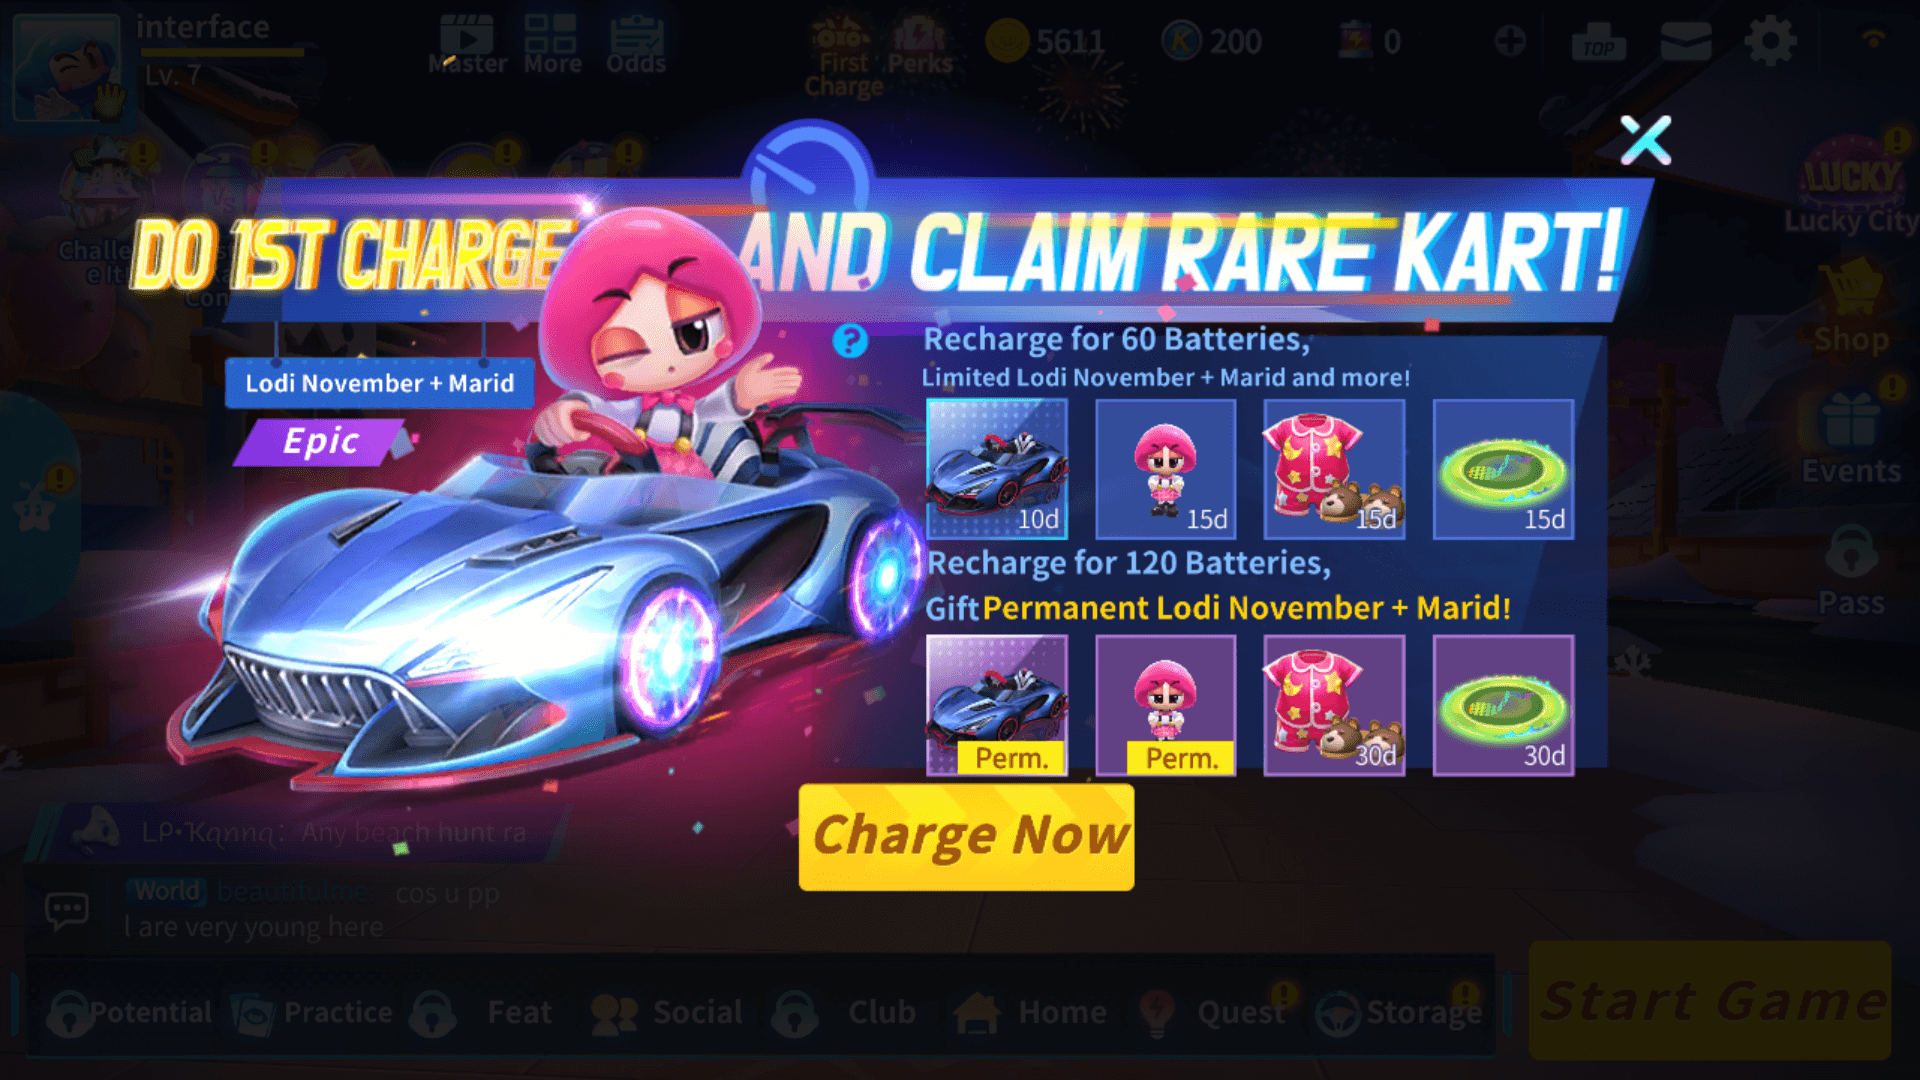 Claim rare kart screenshot of KartRider Rush+ video game interface.